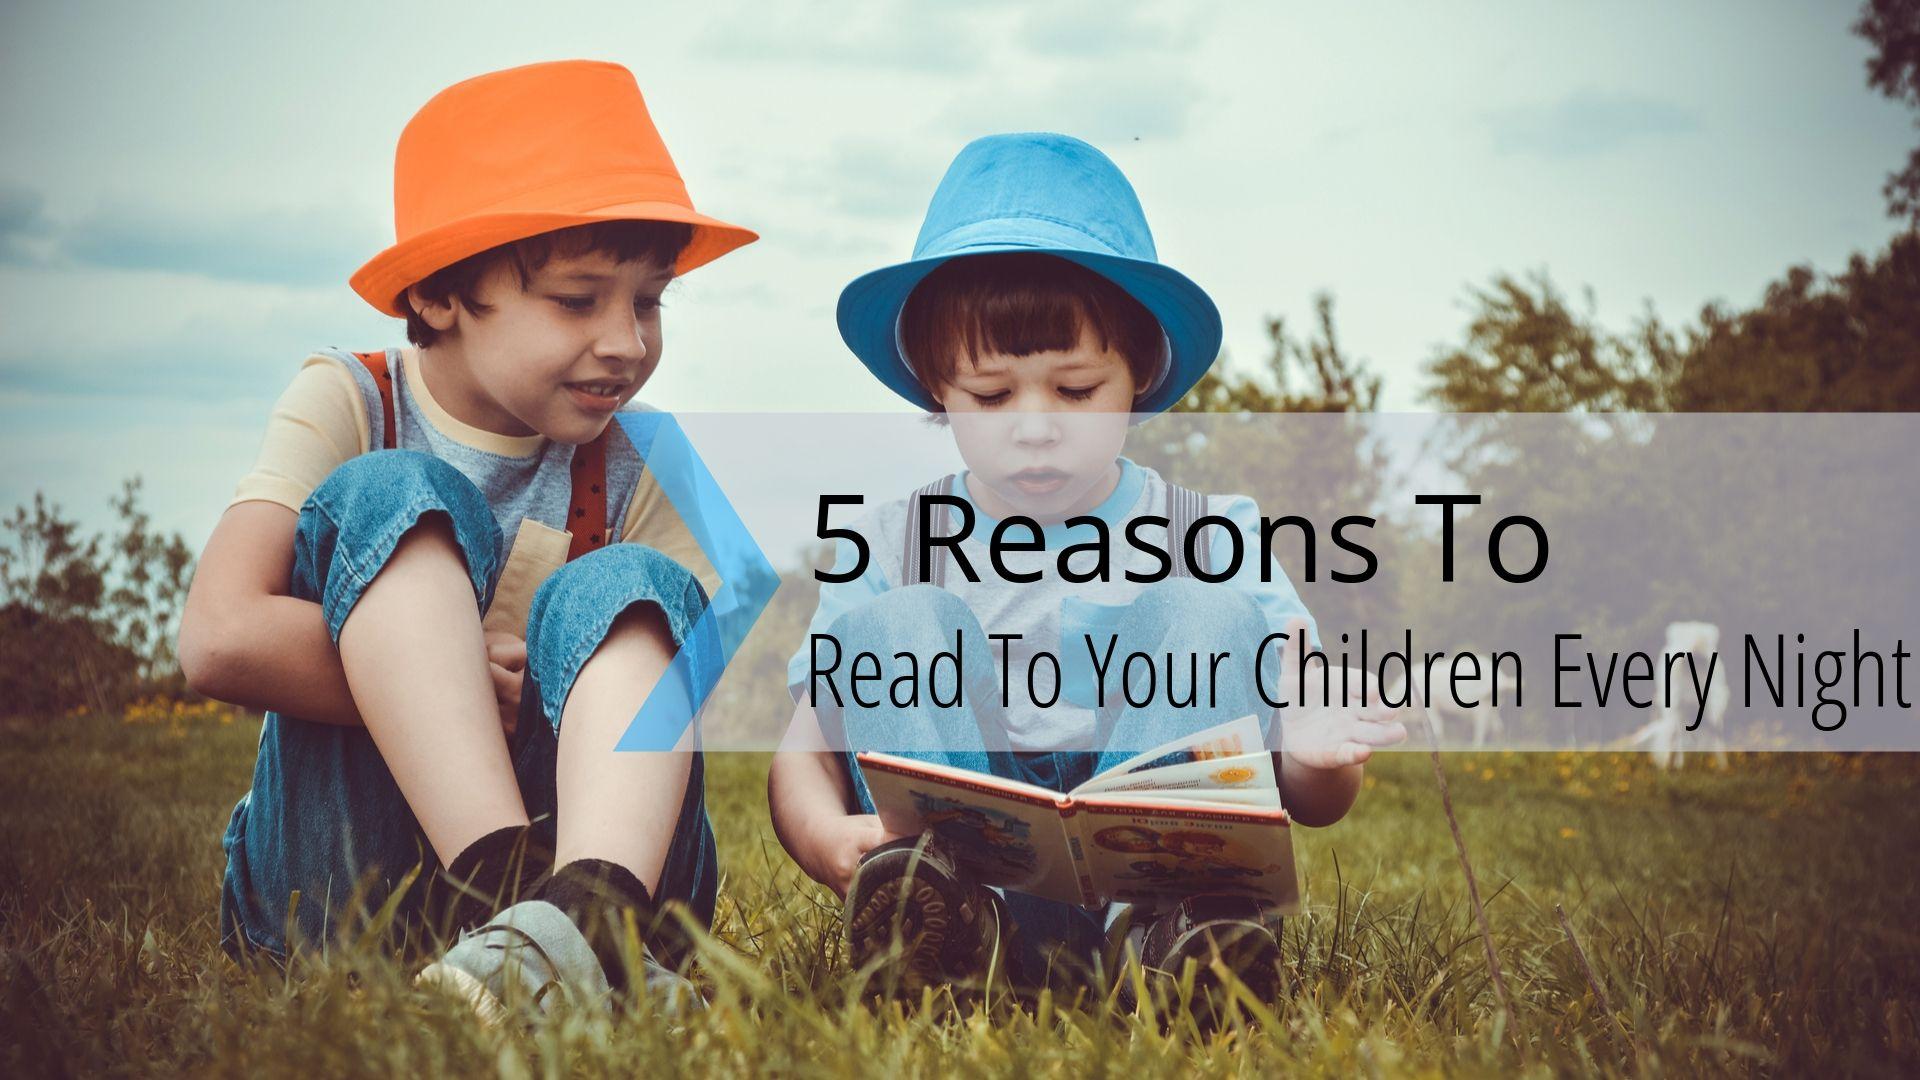 read-kids-every-night